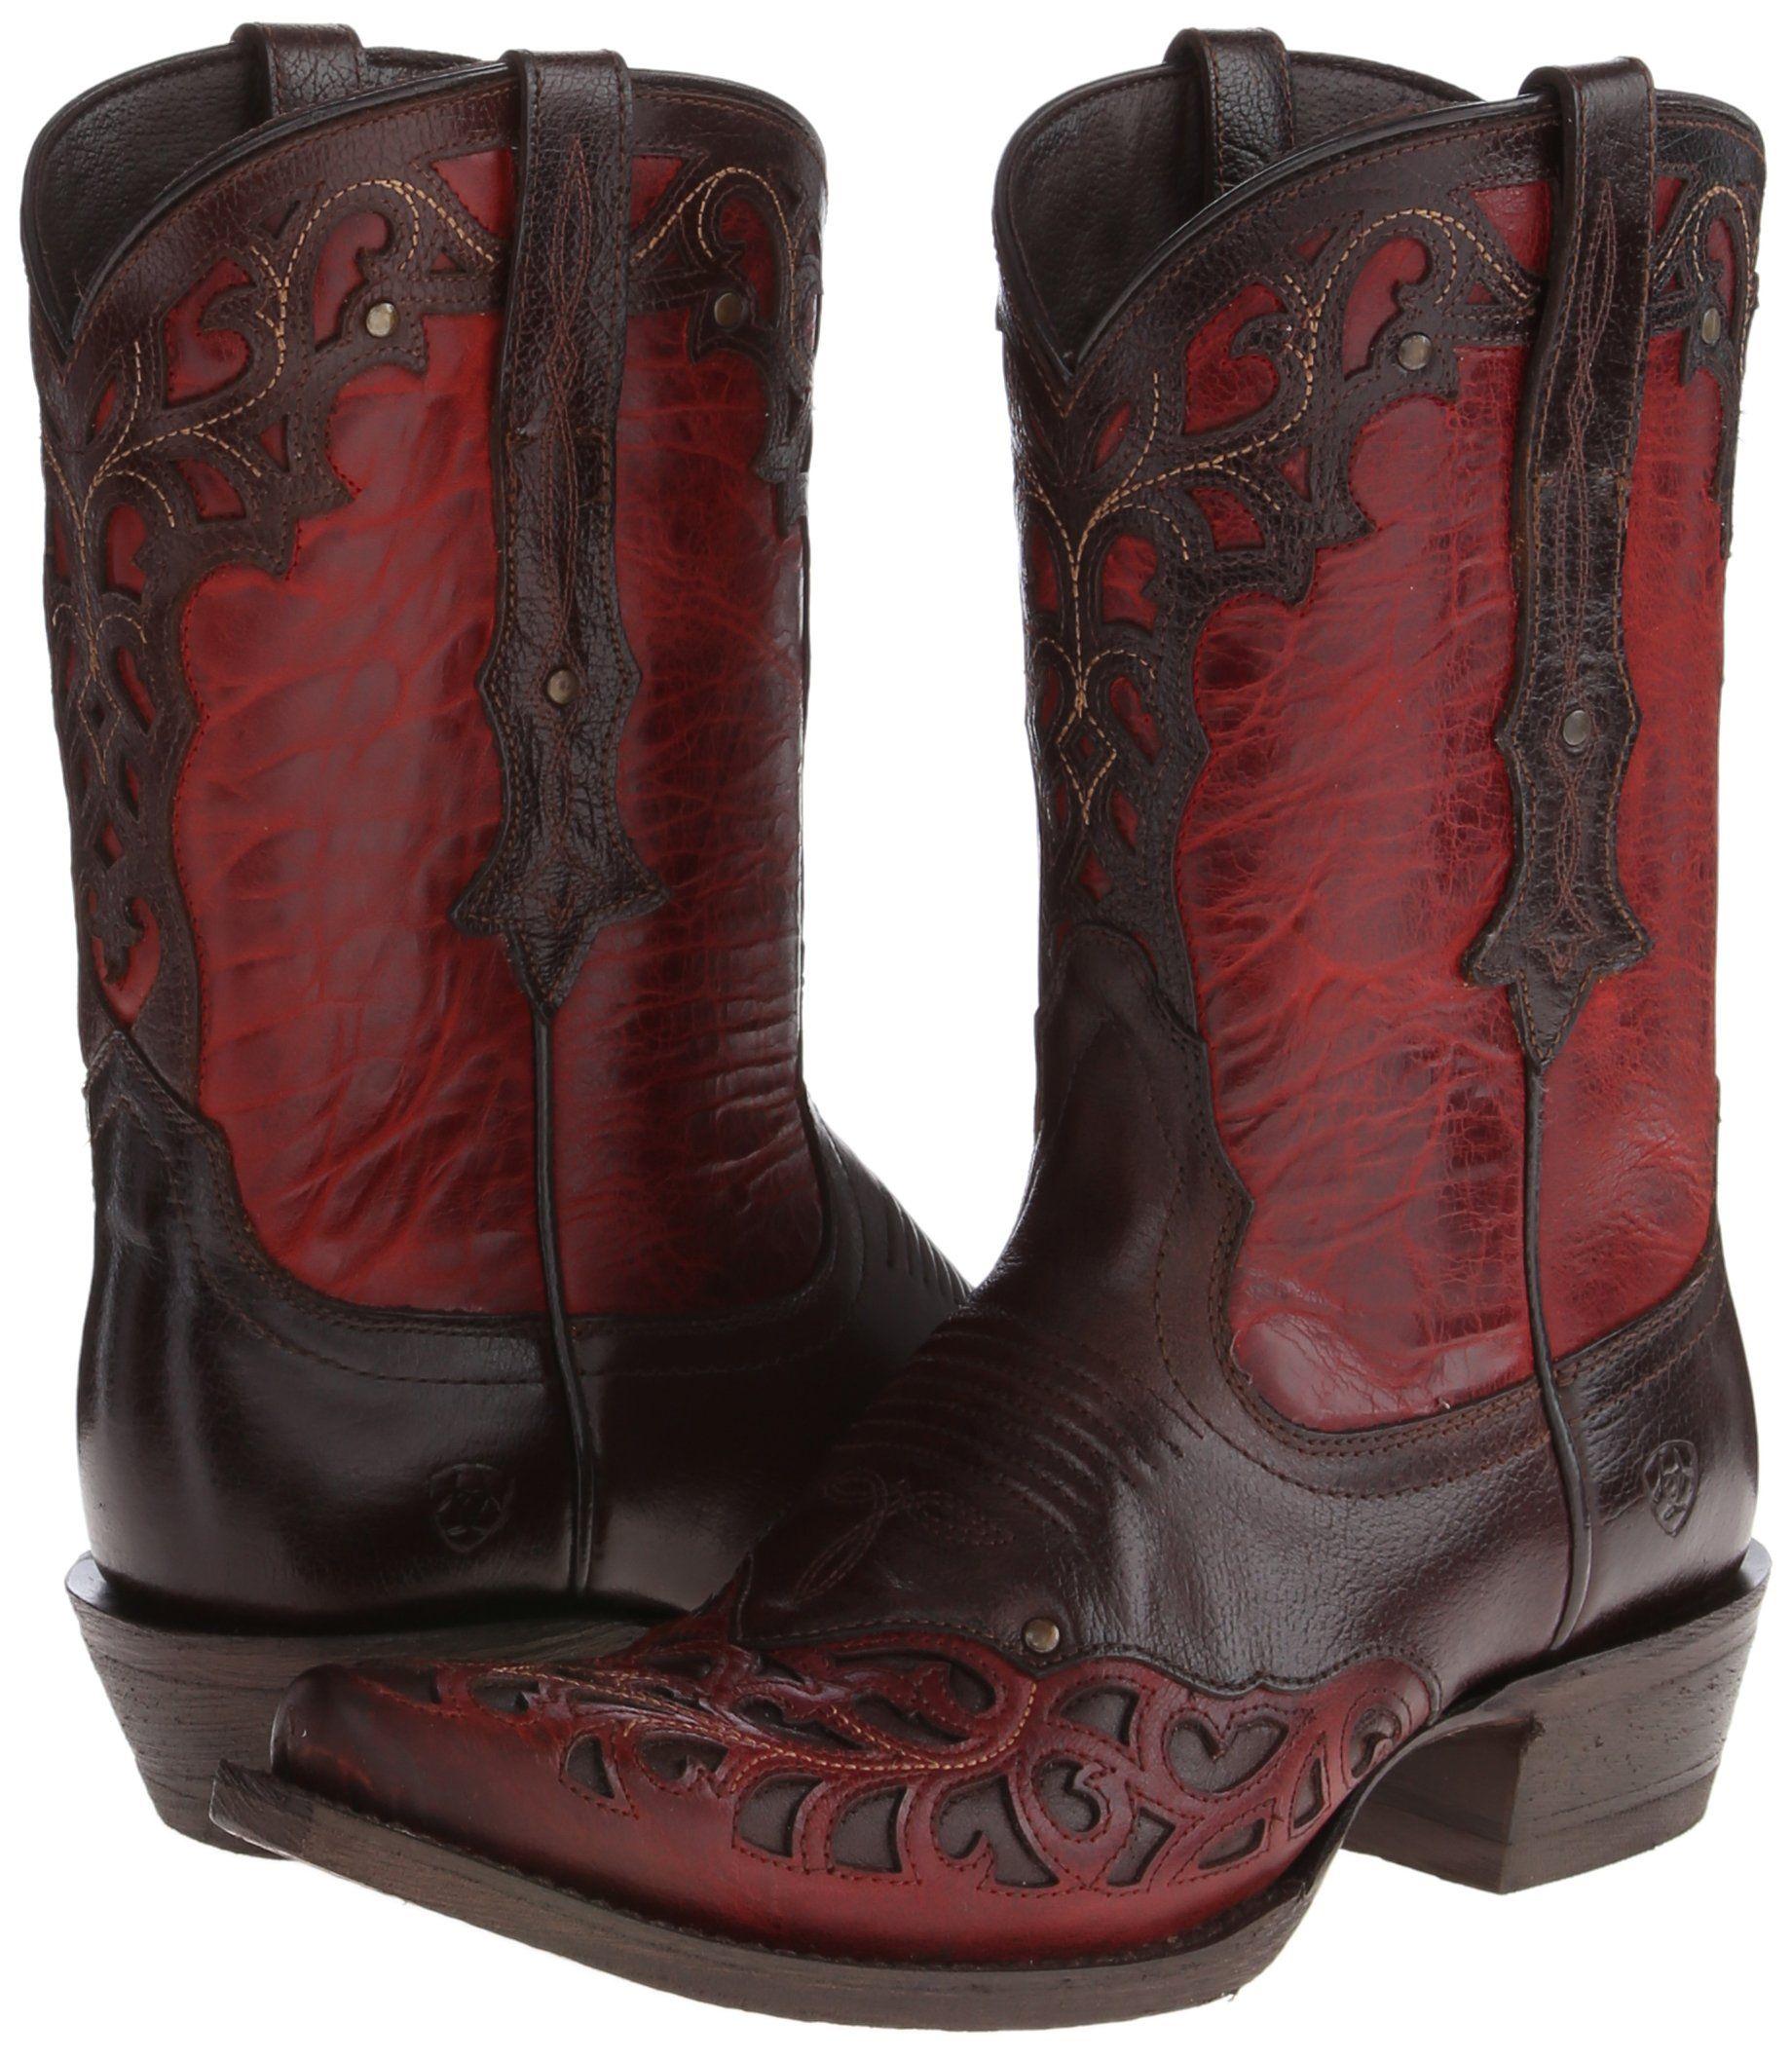 Amazon.com: Ariat Women's Vera Cruz Western Fashion Boot: Shoes